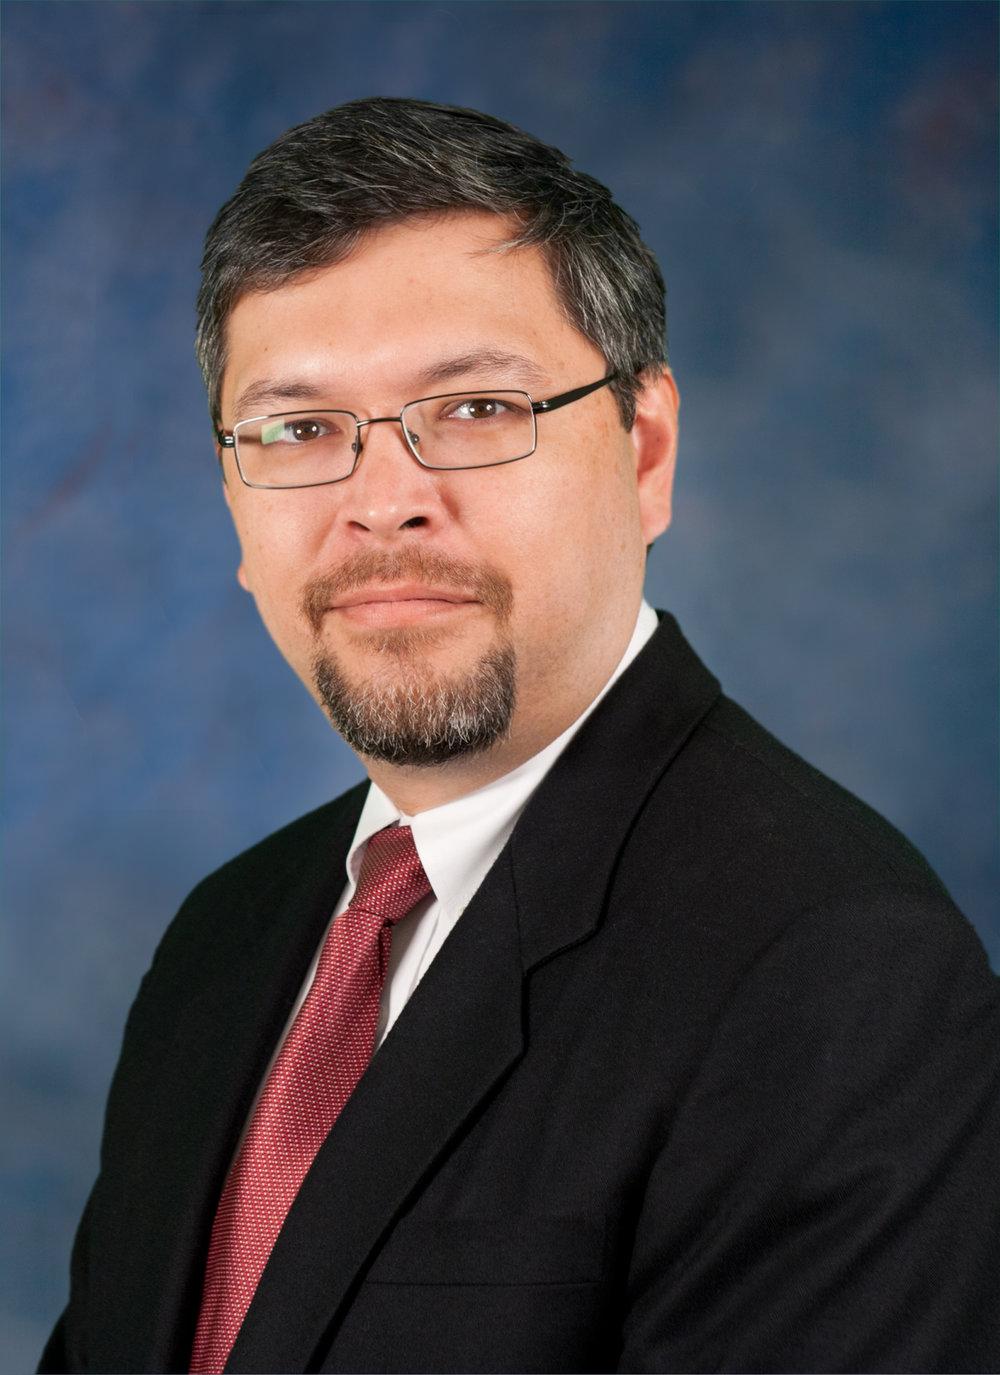 Jeff Leong, Advisor